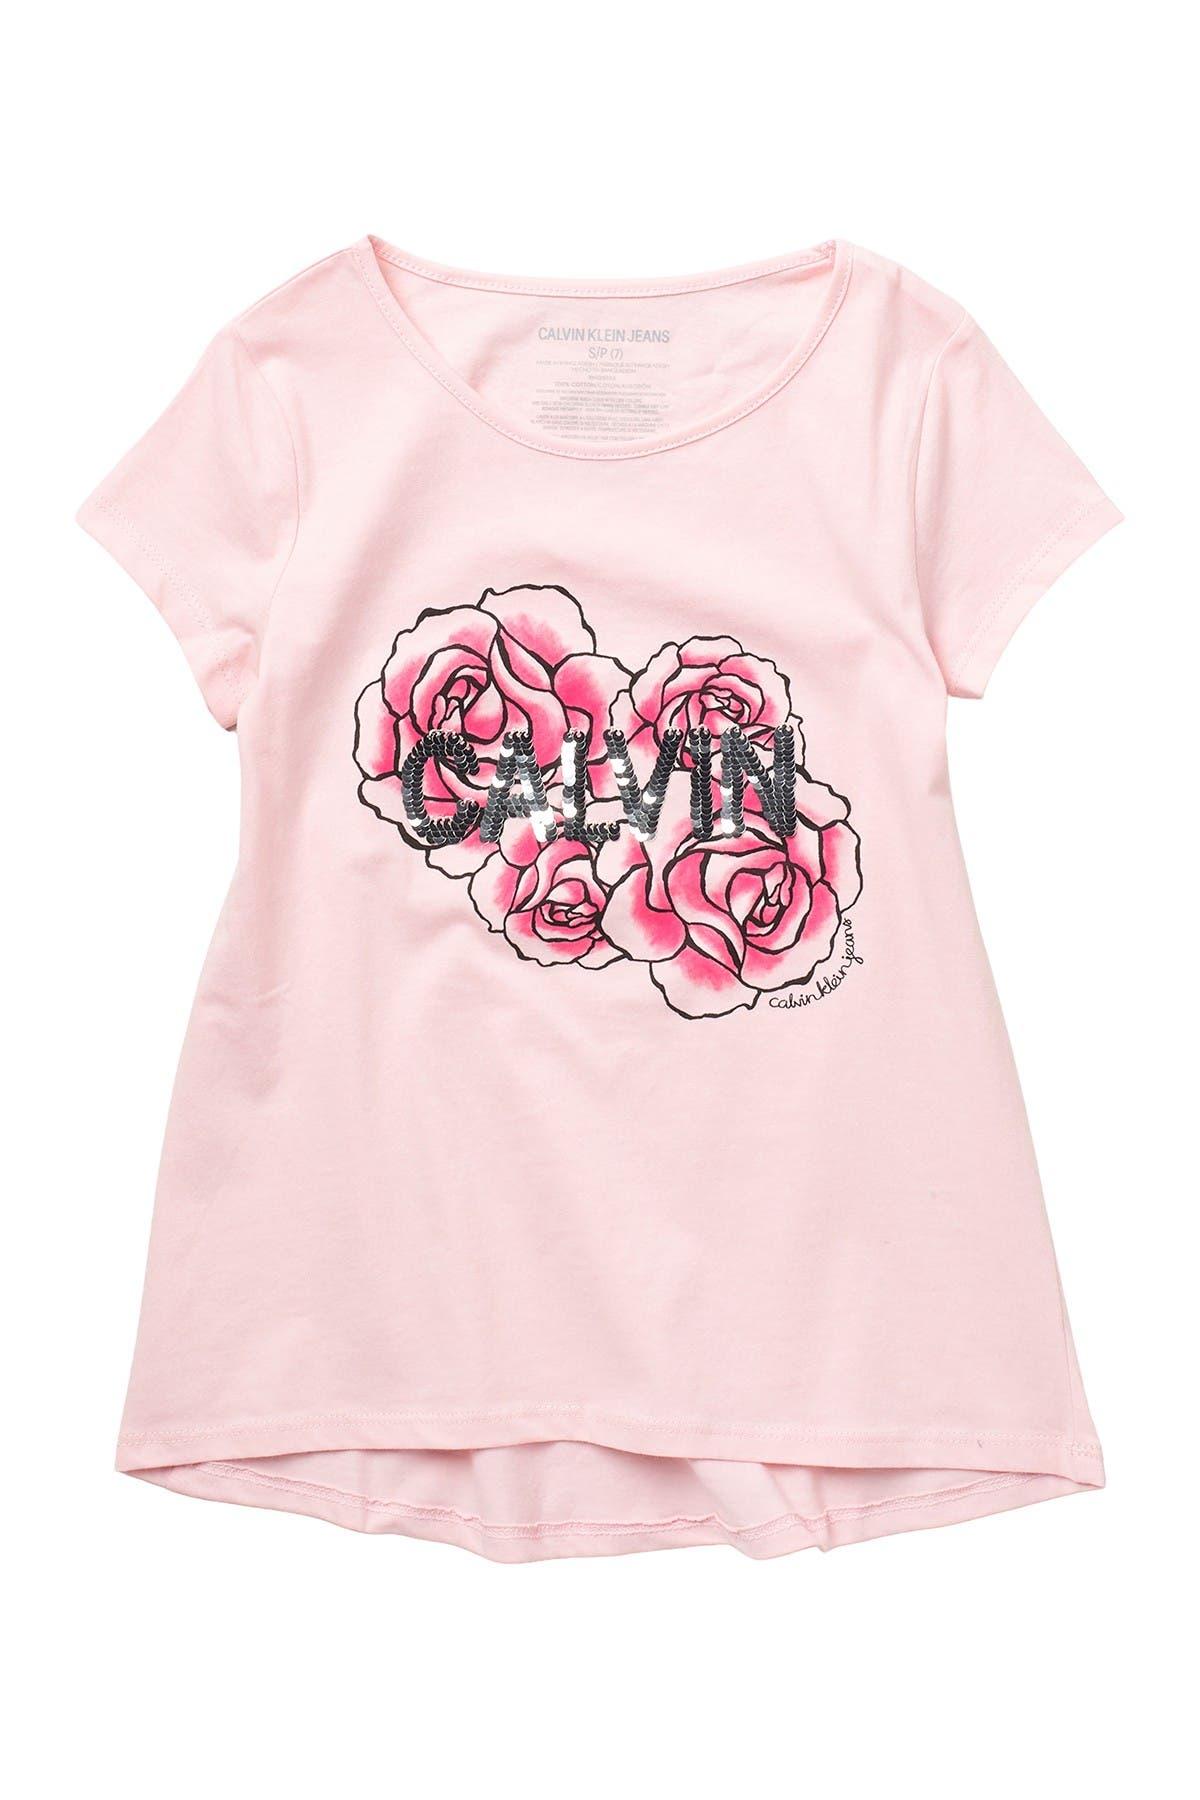 Image of Calvin Klein Super Flower T-Shirt